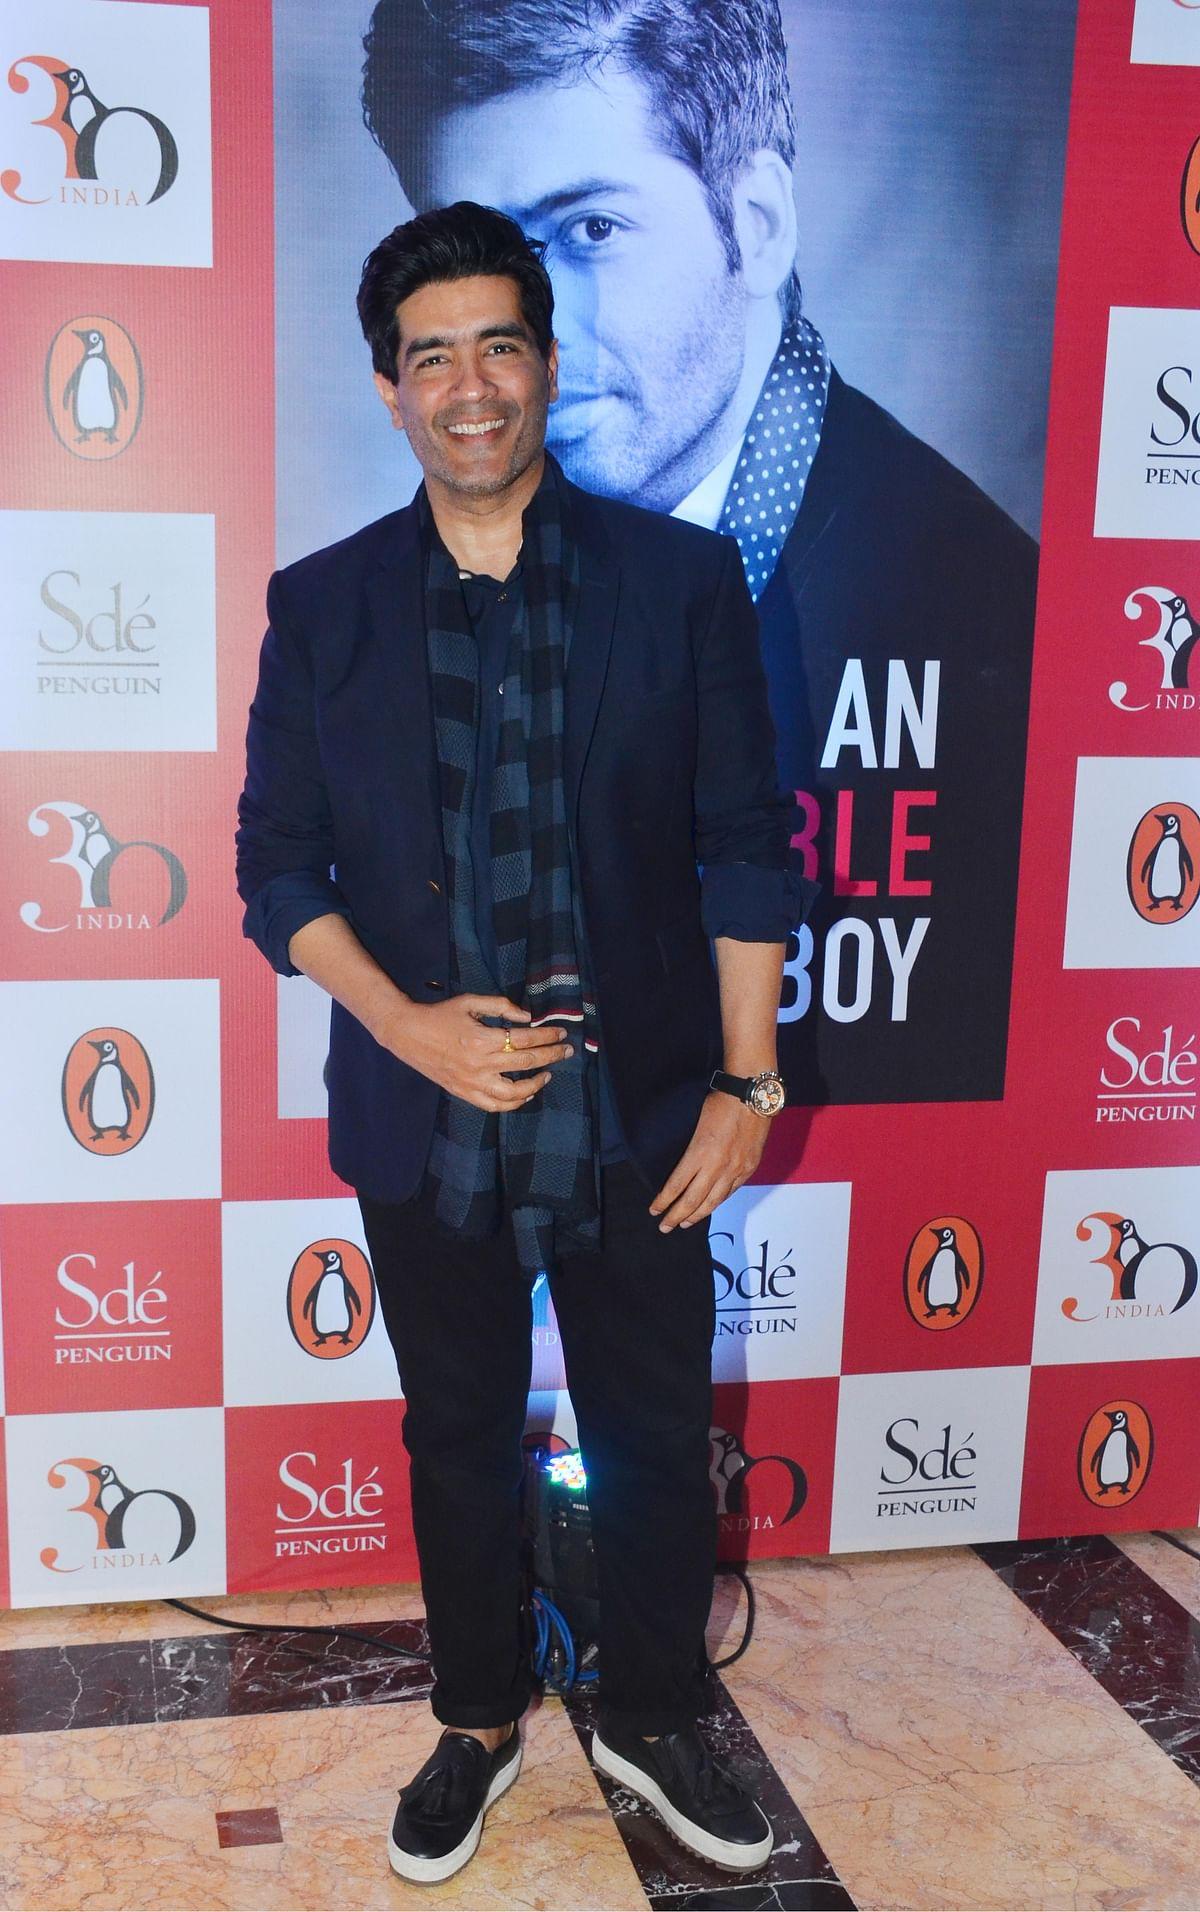 Manish Malhotra, one of Karan Johar's closest friends. (Photo: Yogen Shah)